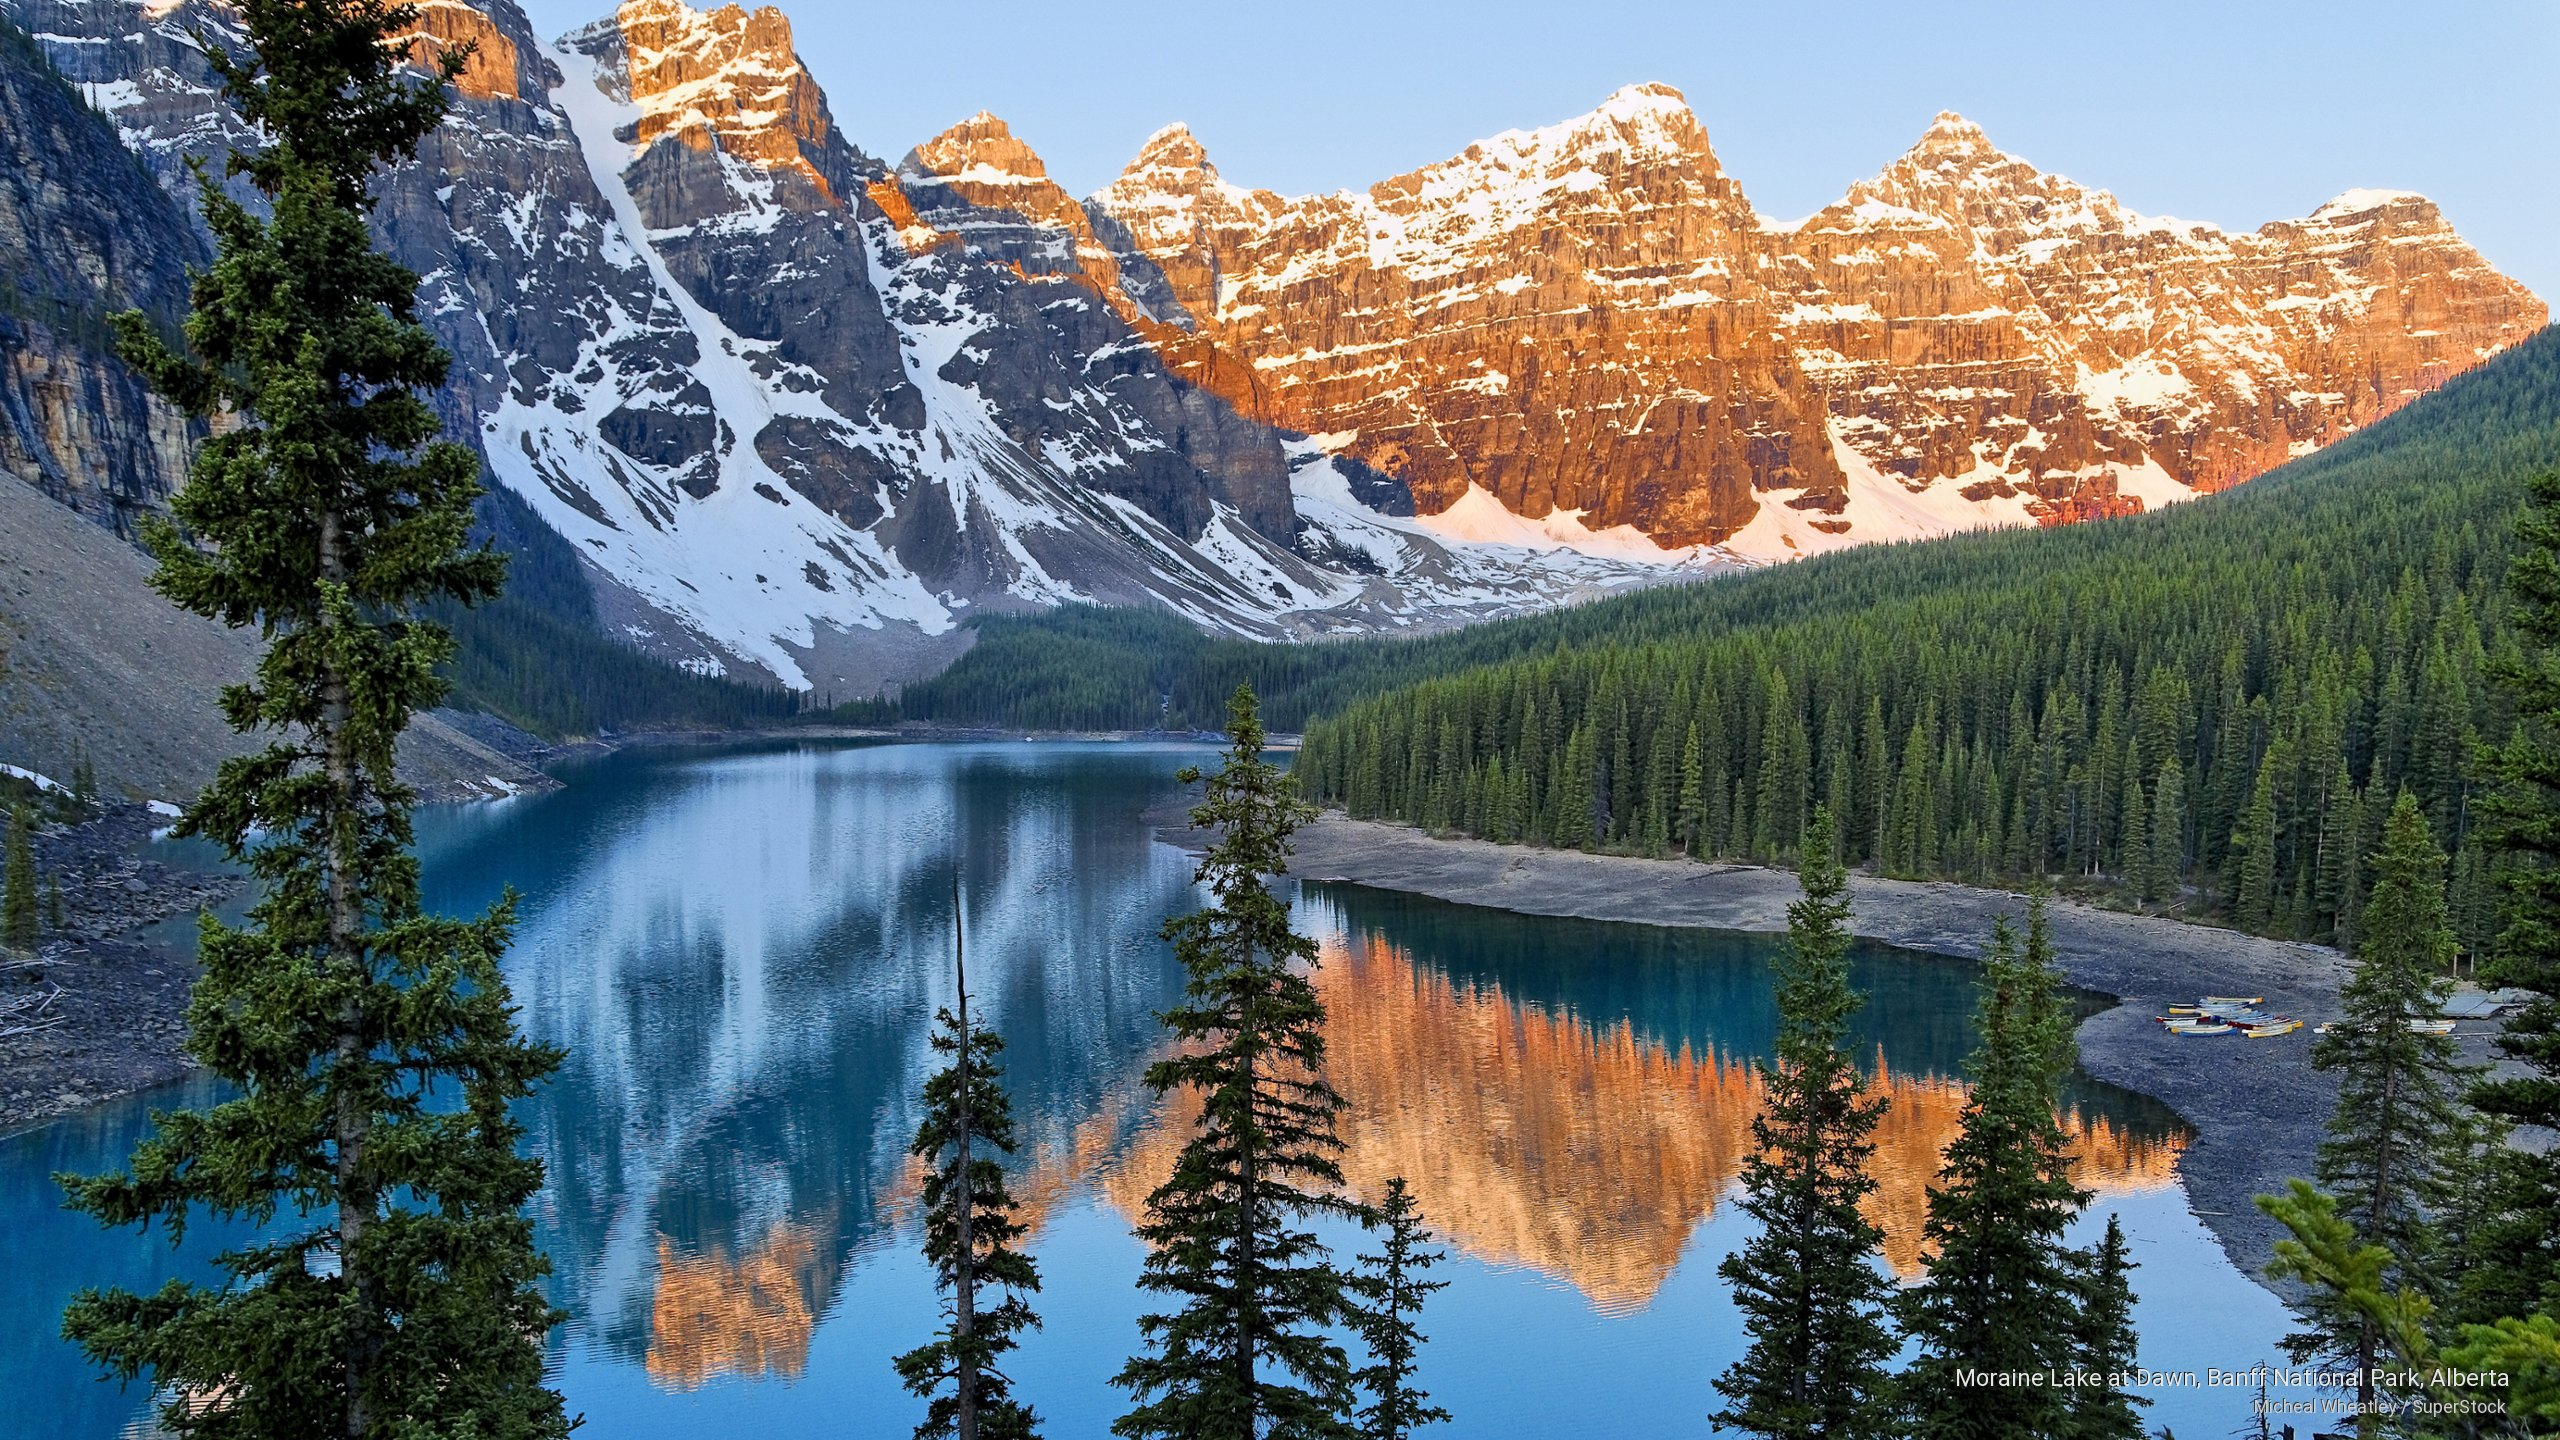 Moraine Lake at Dawn, Banff National Park, Alberta